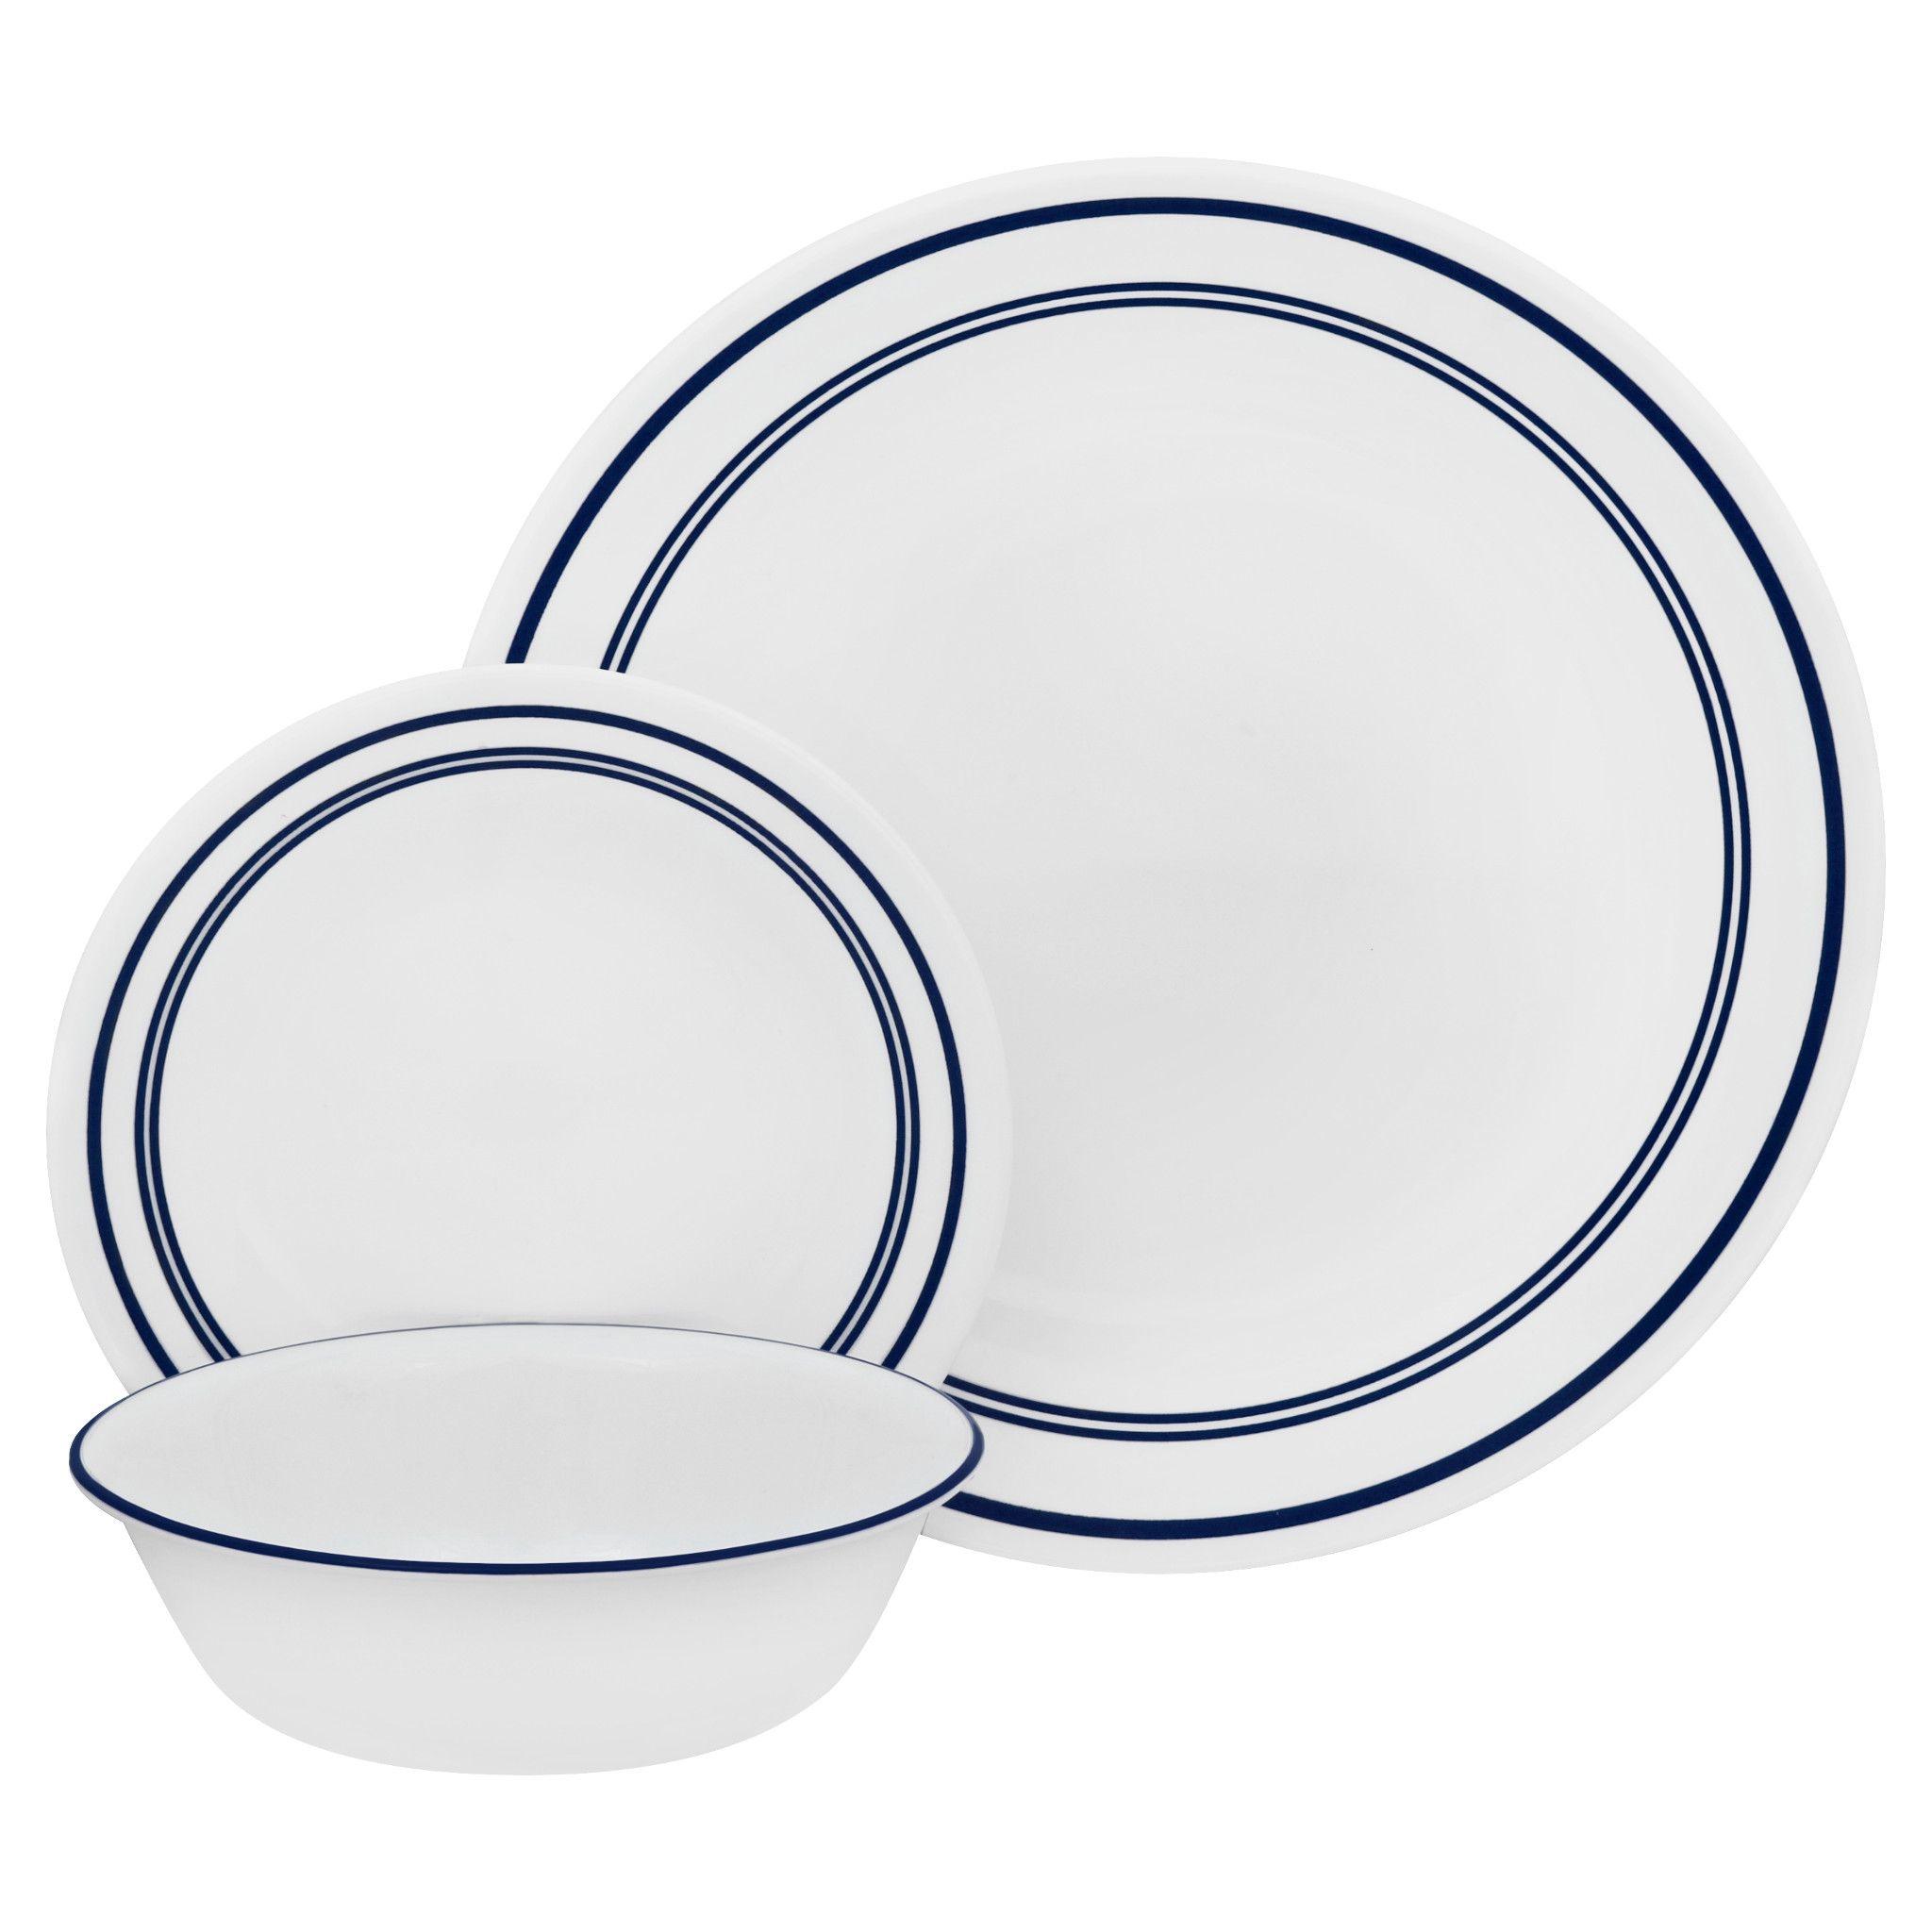 Corelle_Livingware_Classic_Café_Blue_18pc_Dinnerware_Set